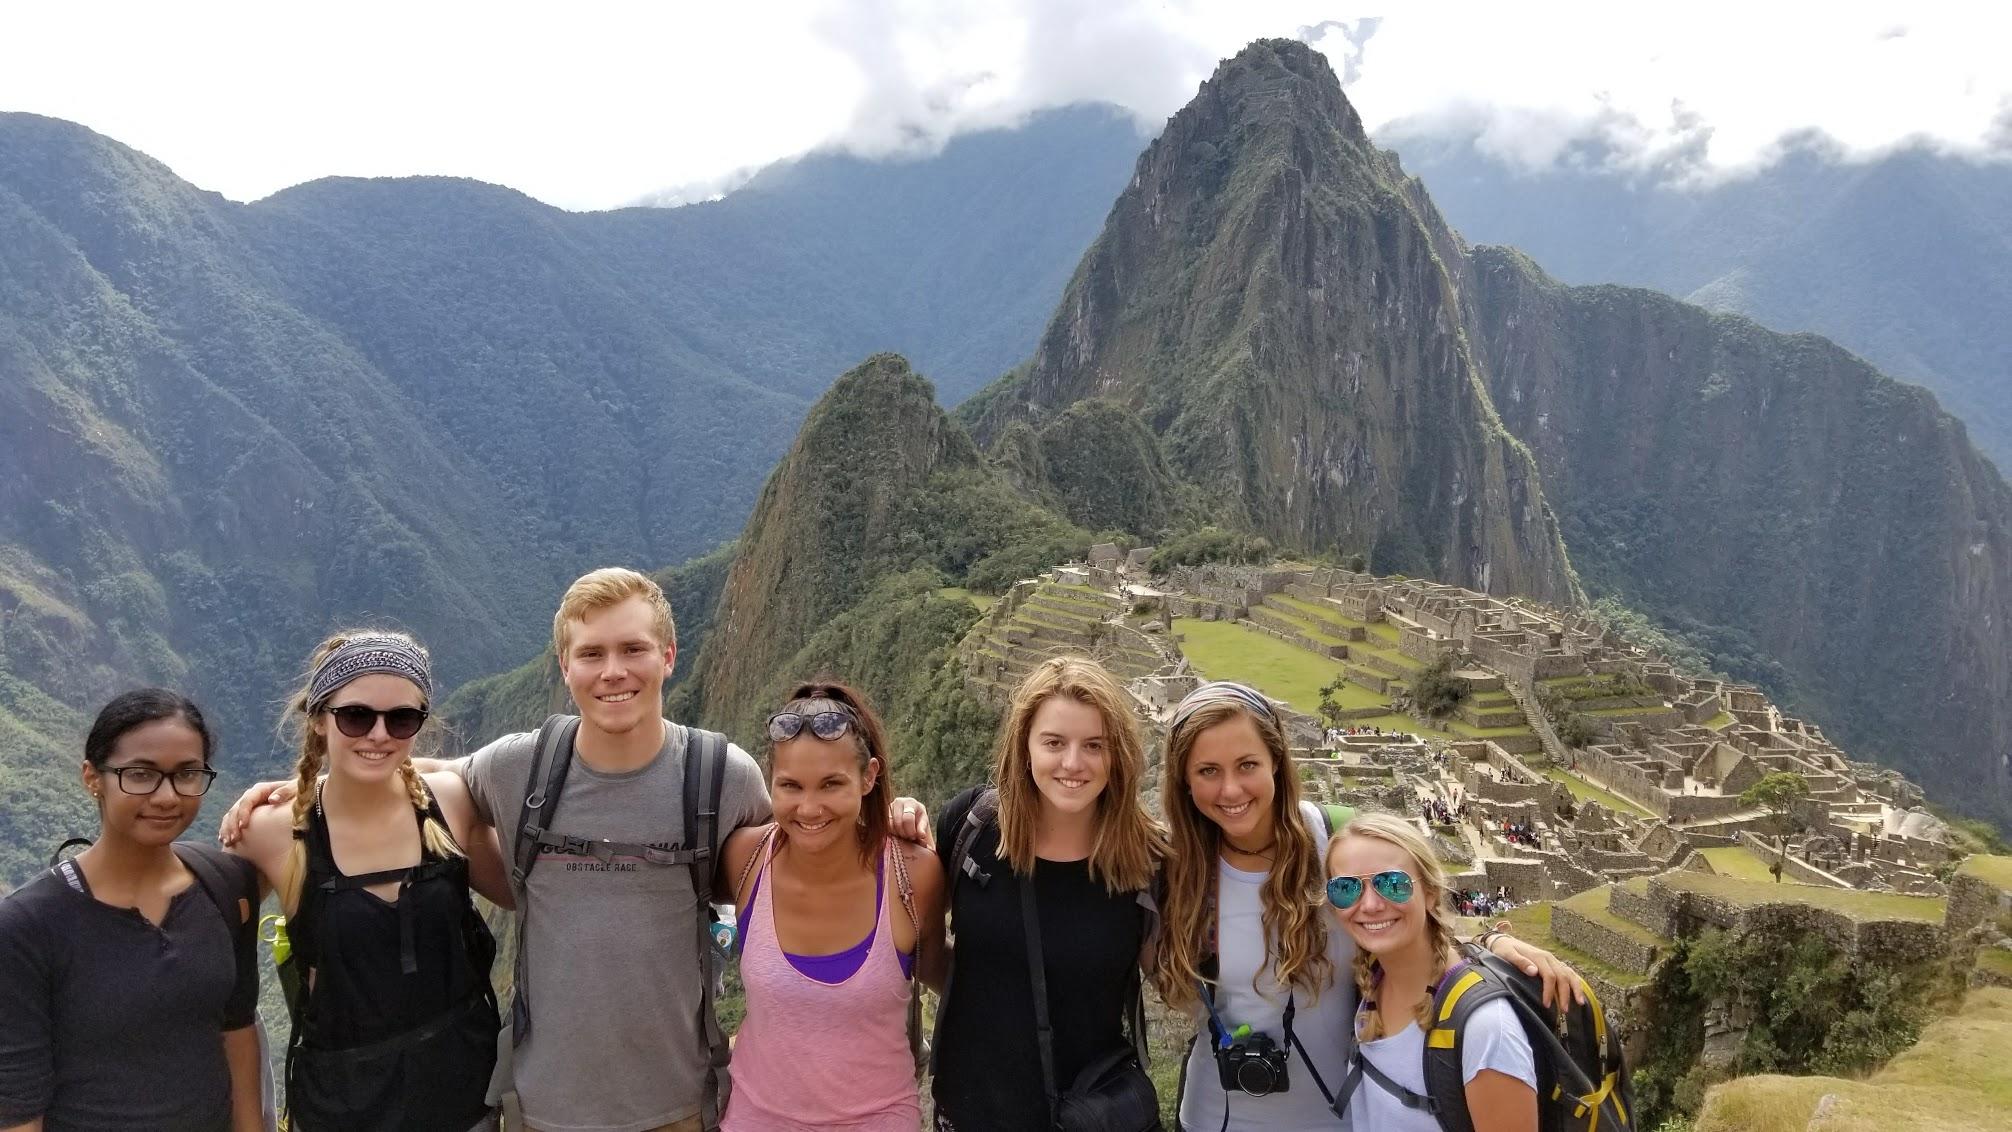 My interns hiking at Machu Picchu!